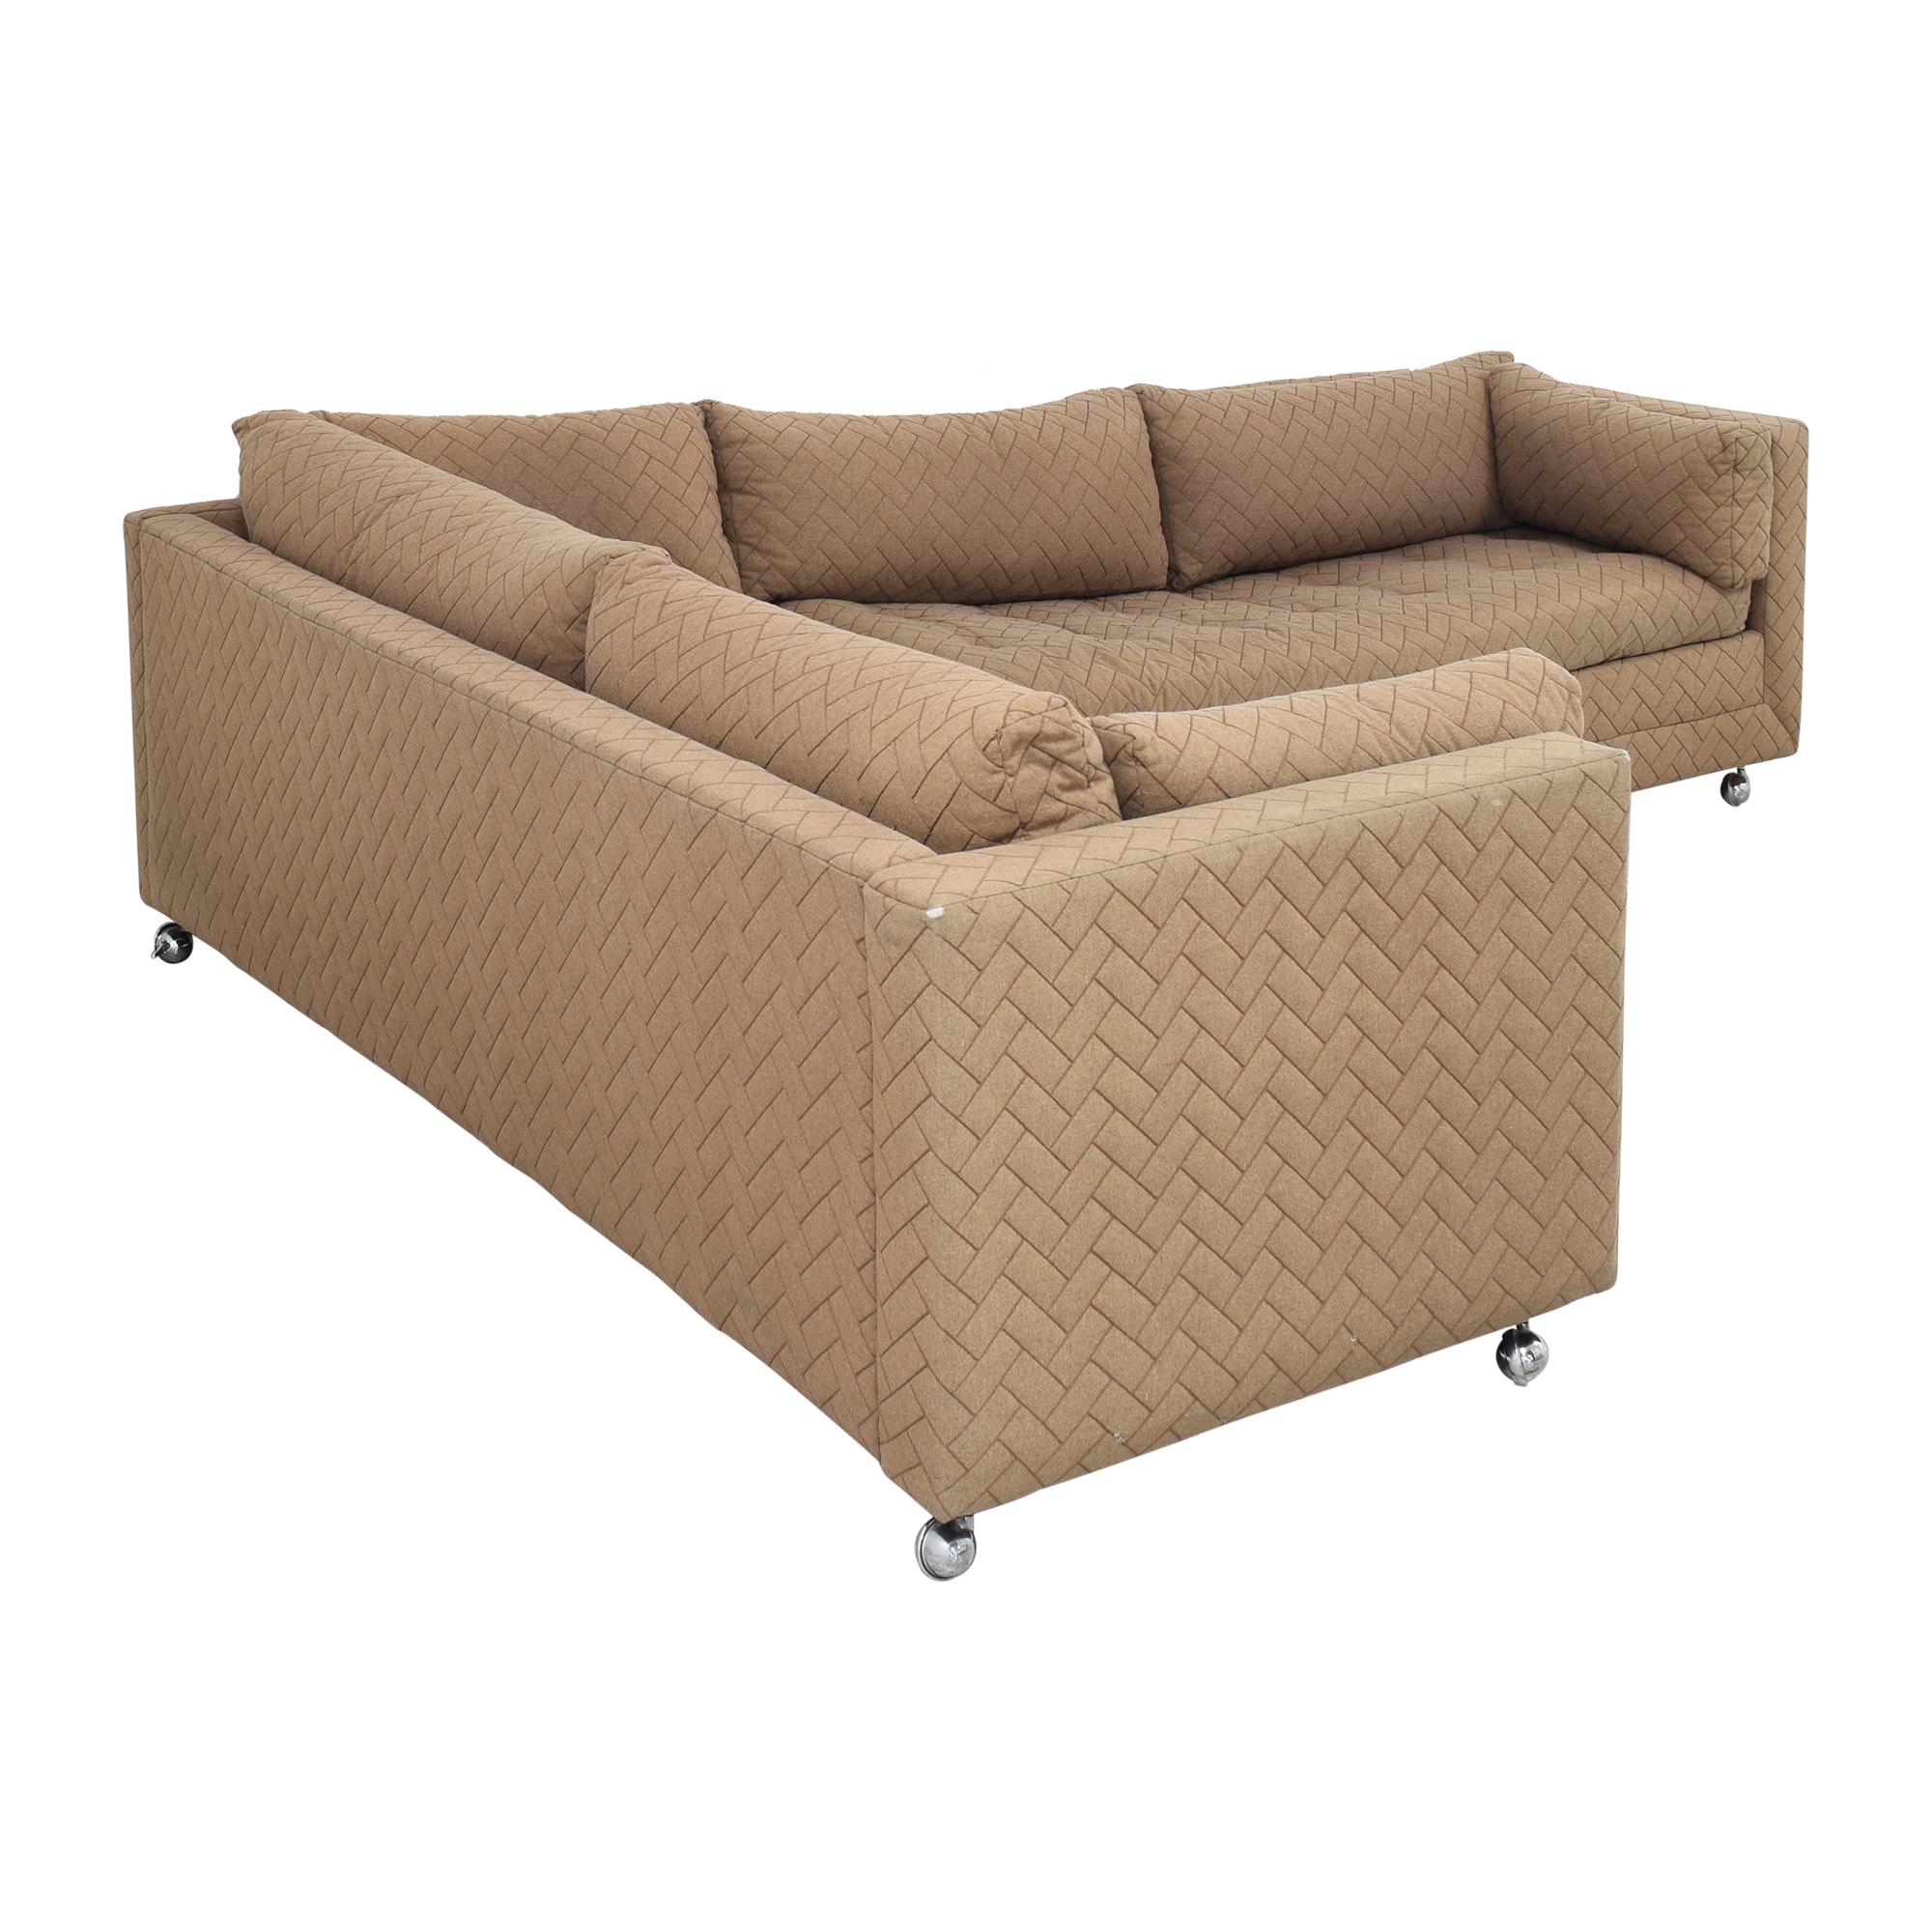 buy Avery Boardman Corner Sectional Sleeper Sofa Avery Boardman Sectionals